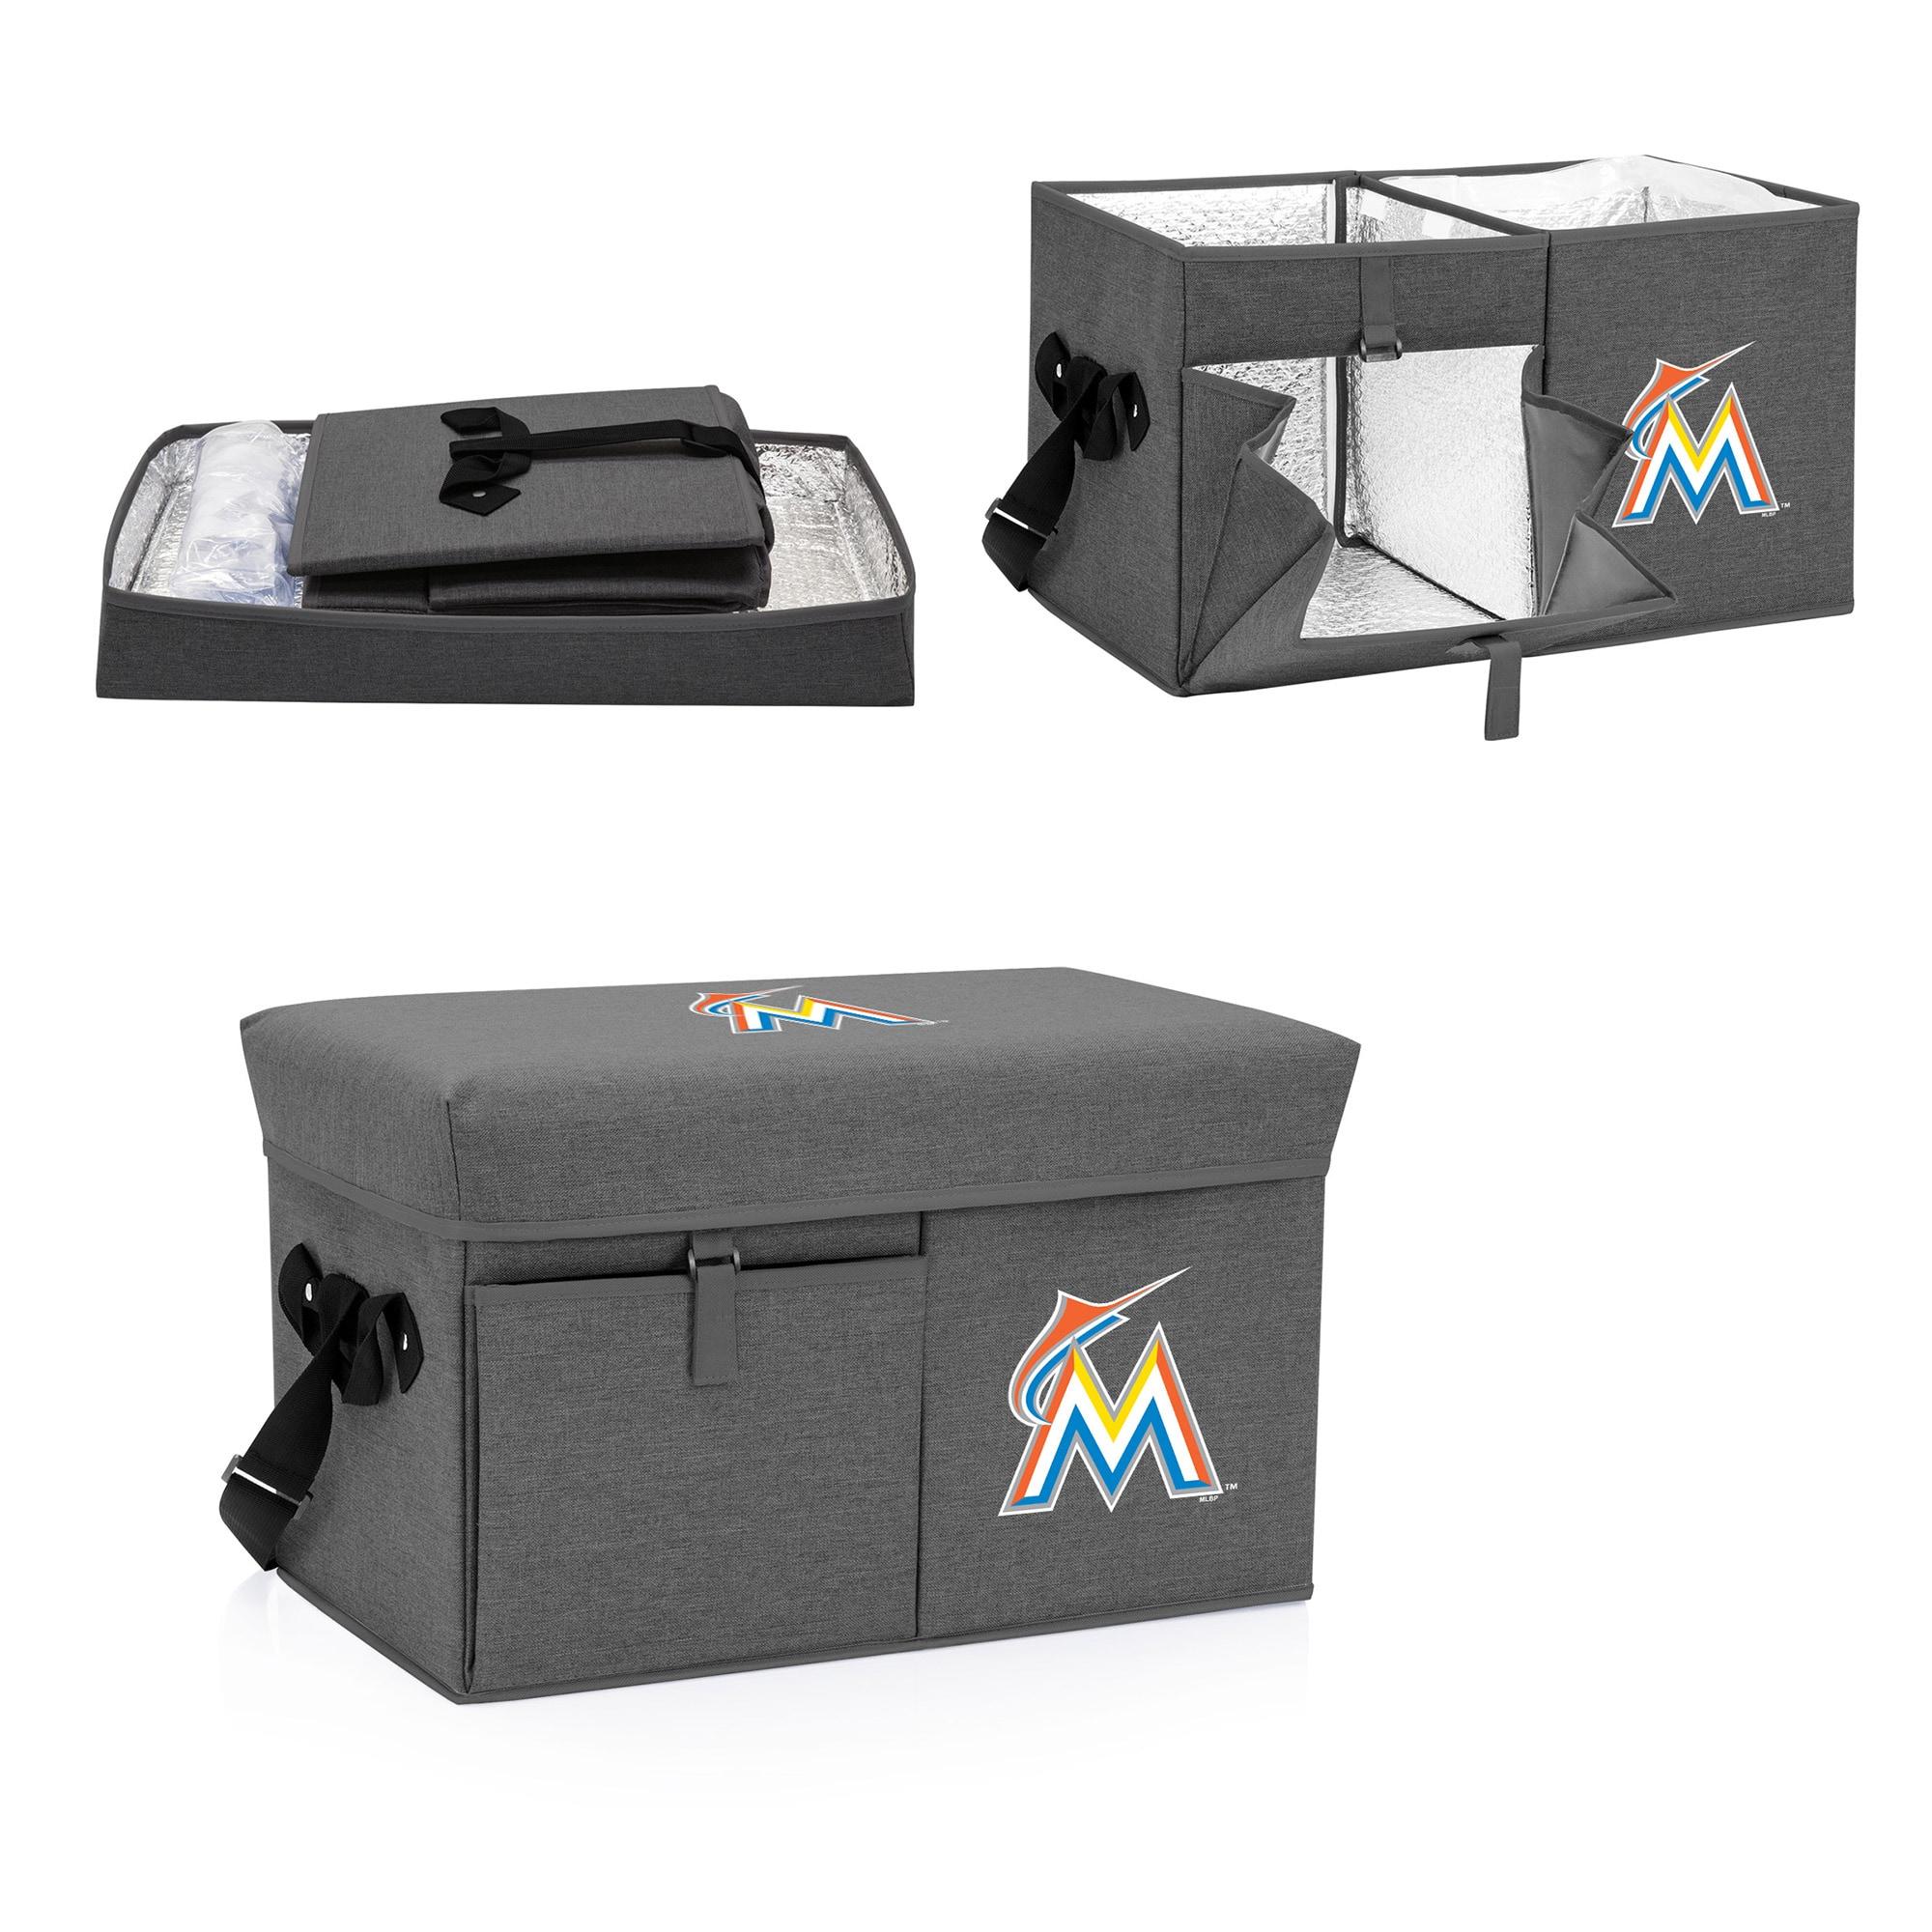 Miami Marlins Ottoman Cooler & Seat - Gray